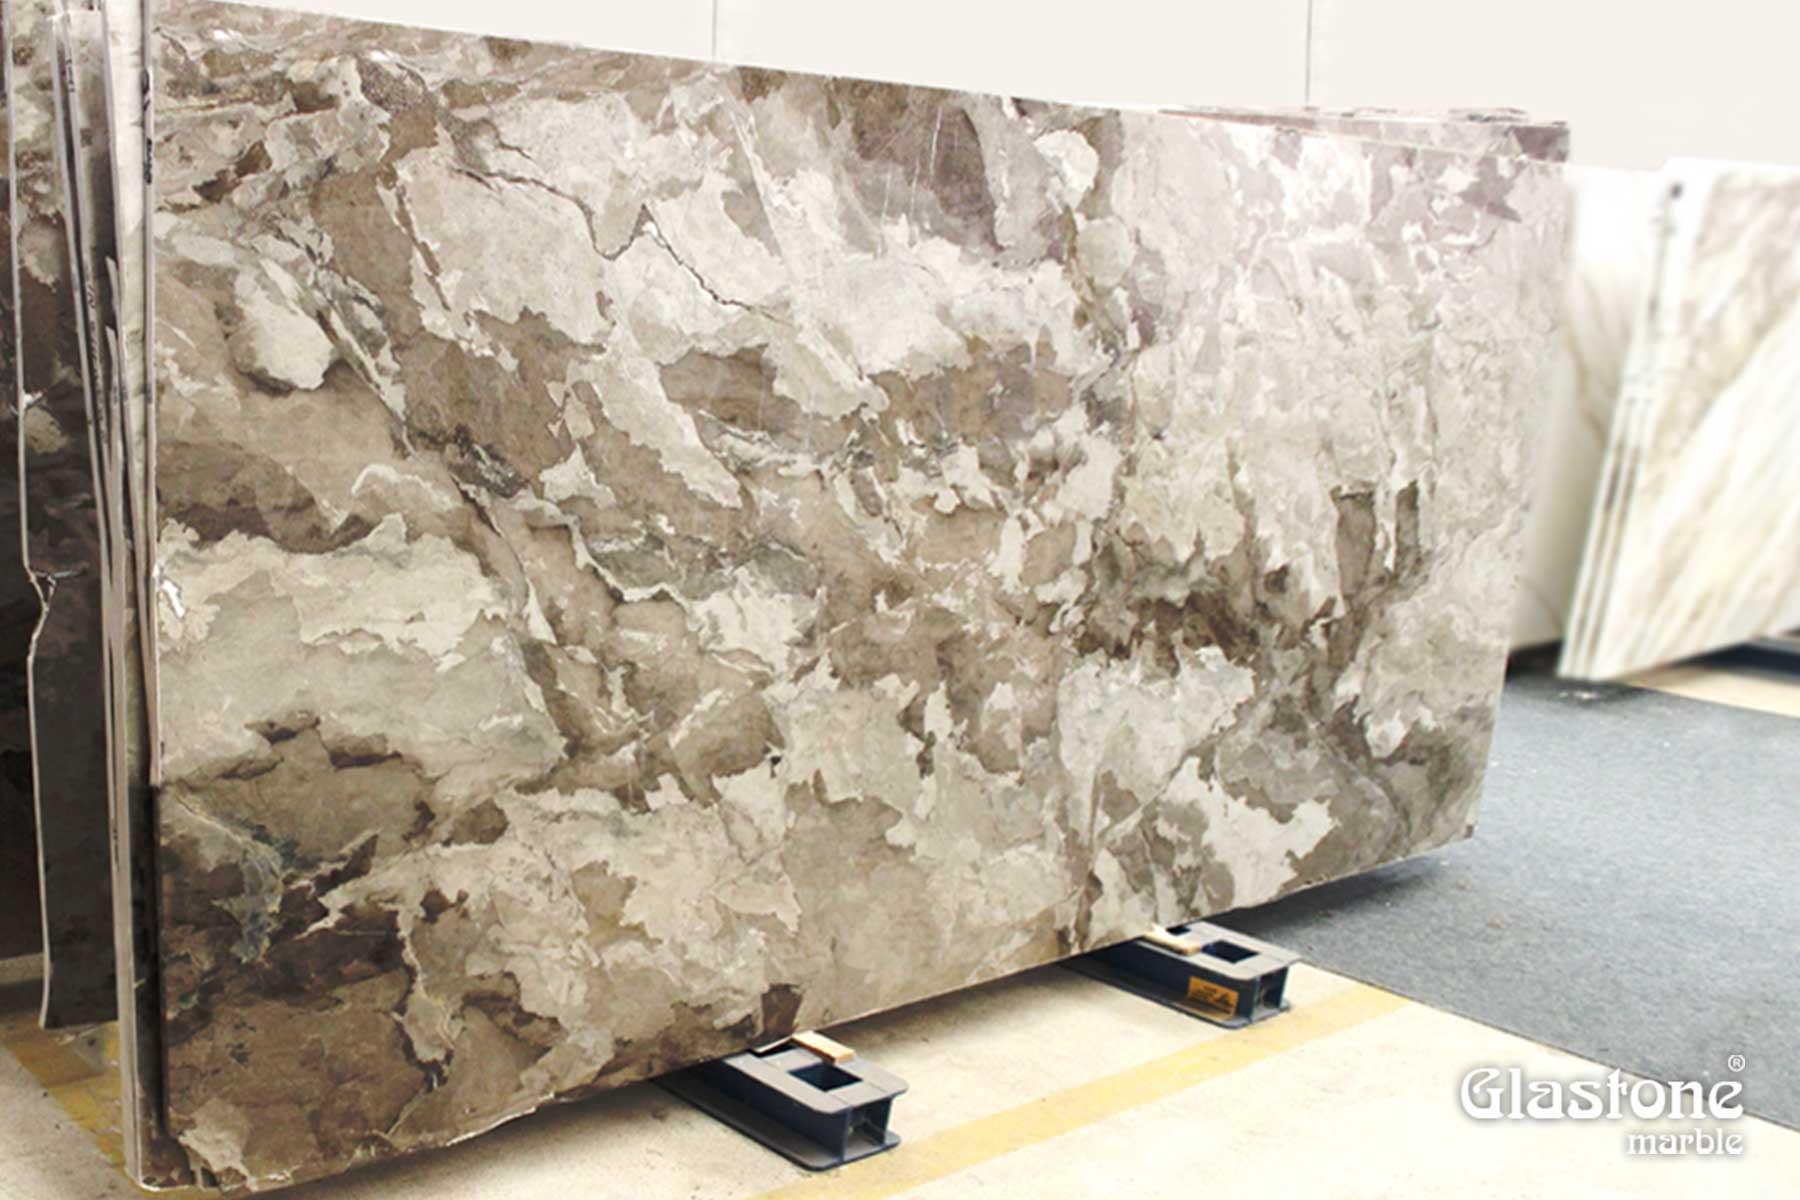 glastone marble marmol solerialaminado vidrio marmol natural tabacum